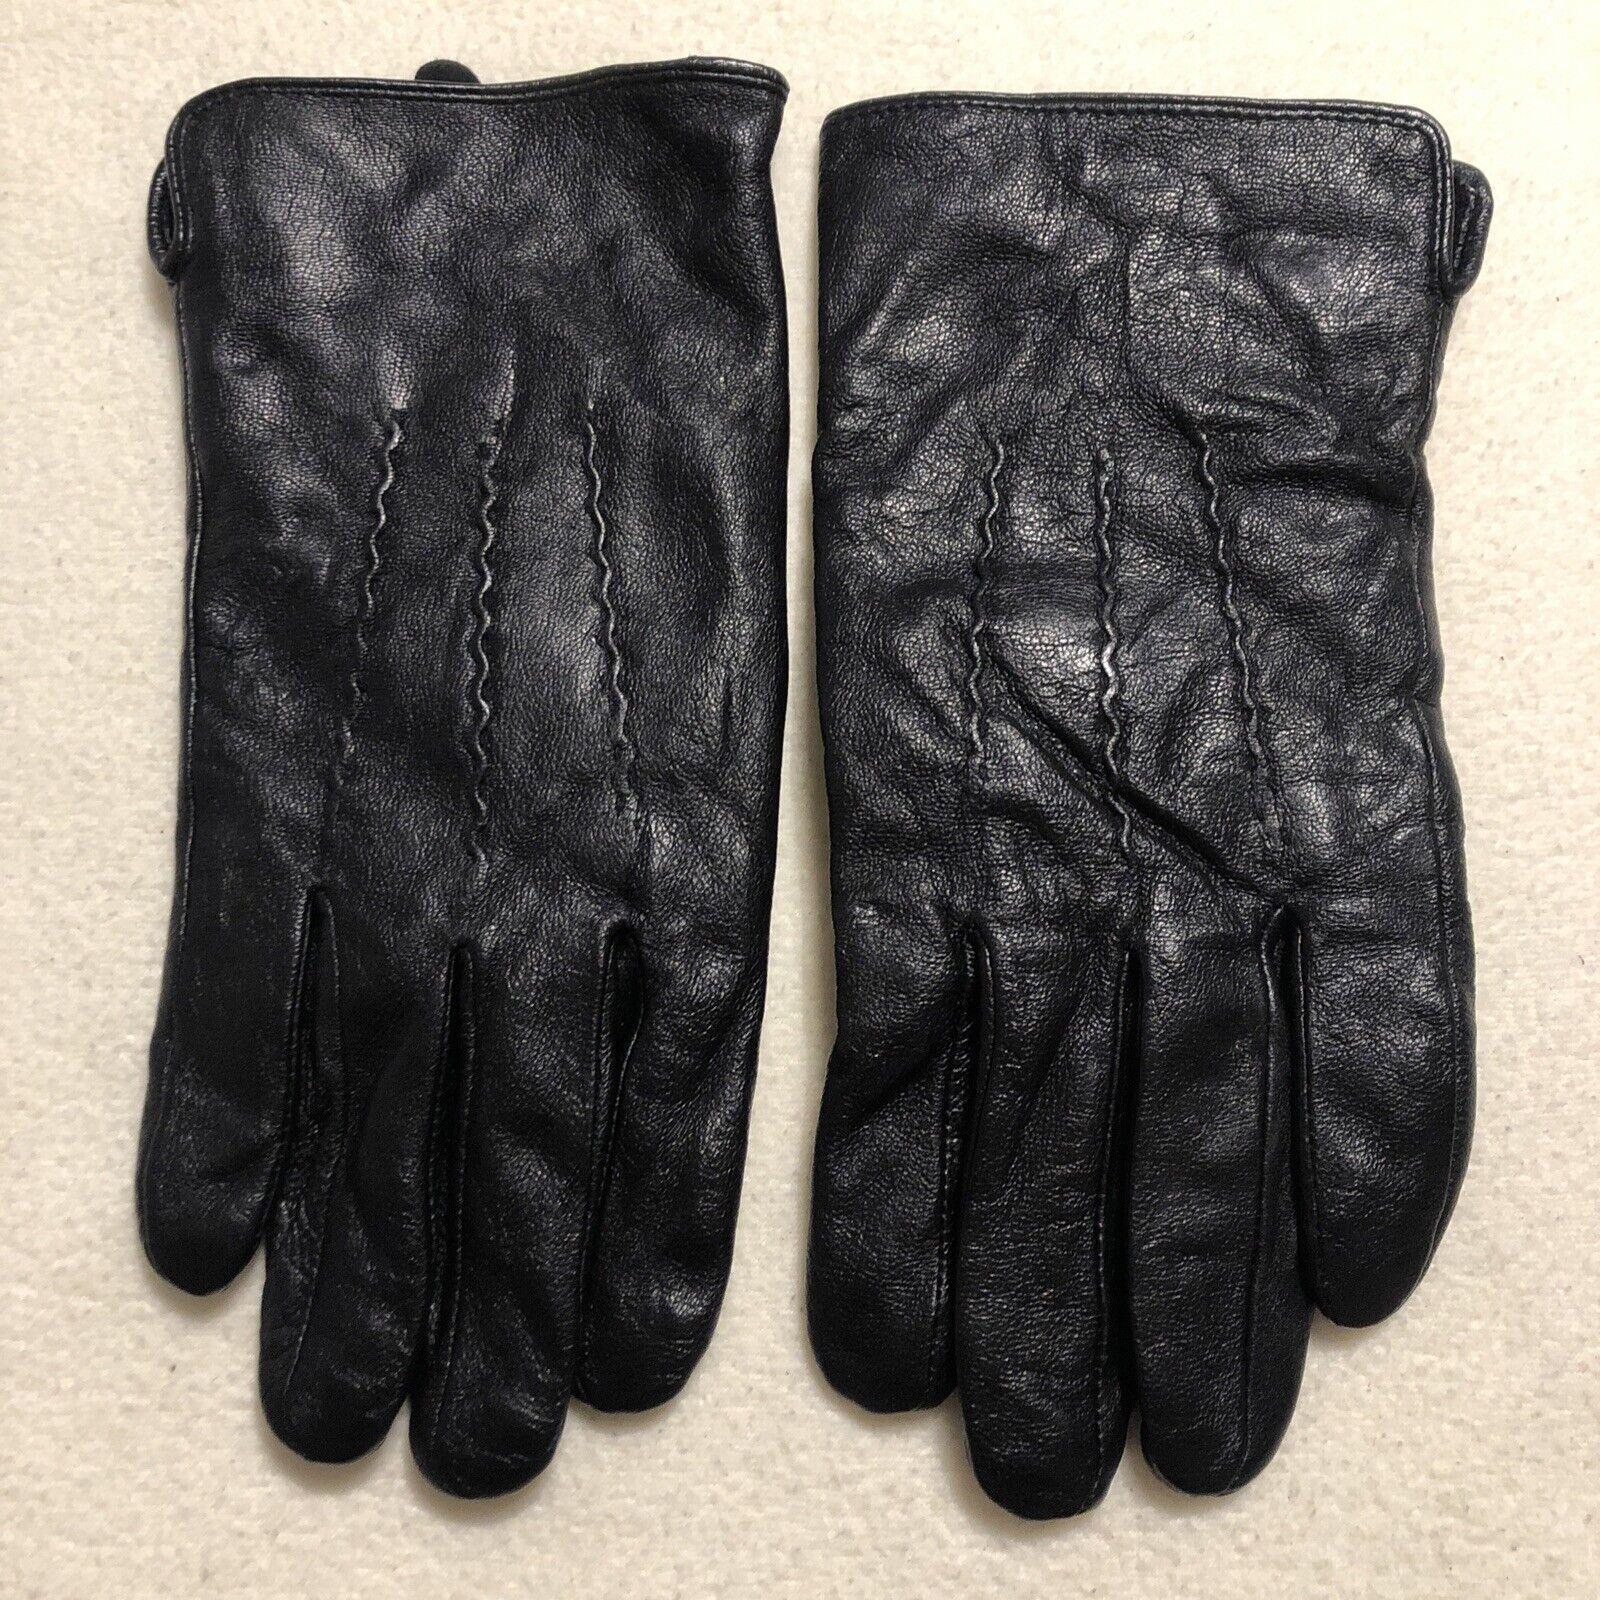 Birreti Black Leather Gloves. Mens Size 11.5